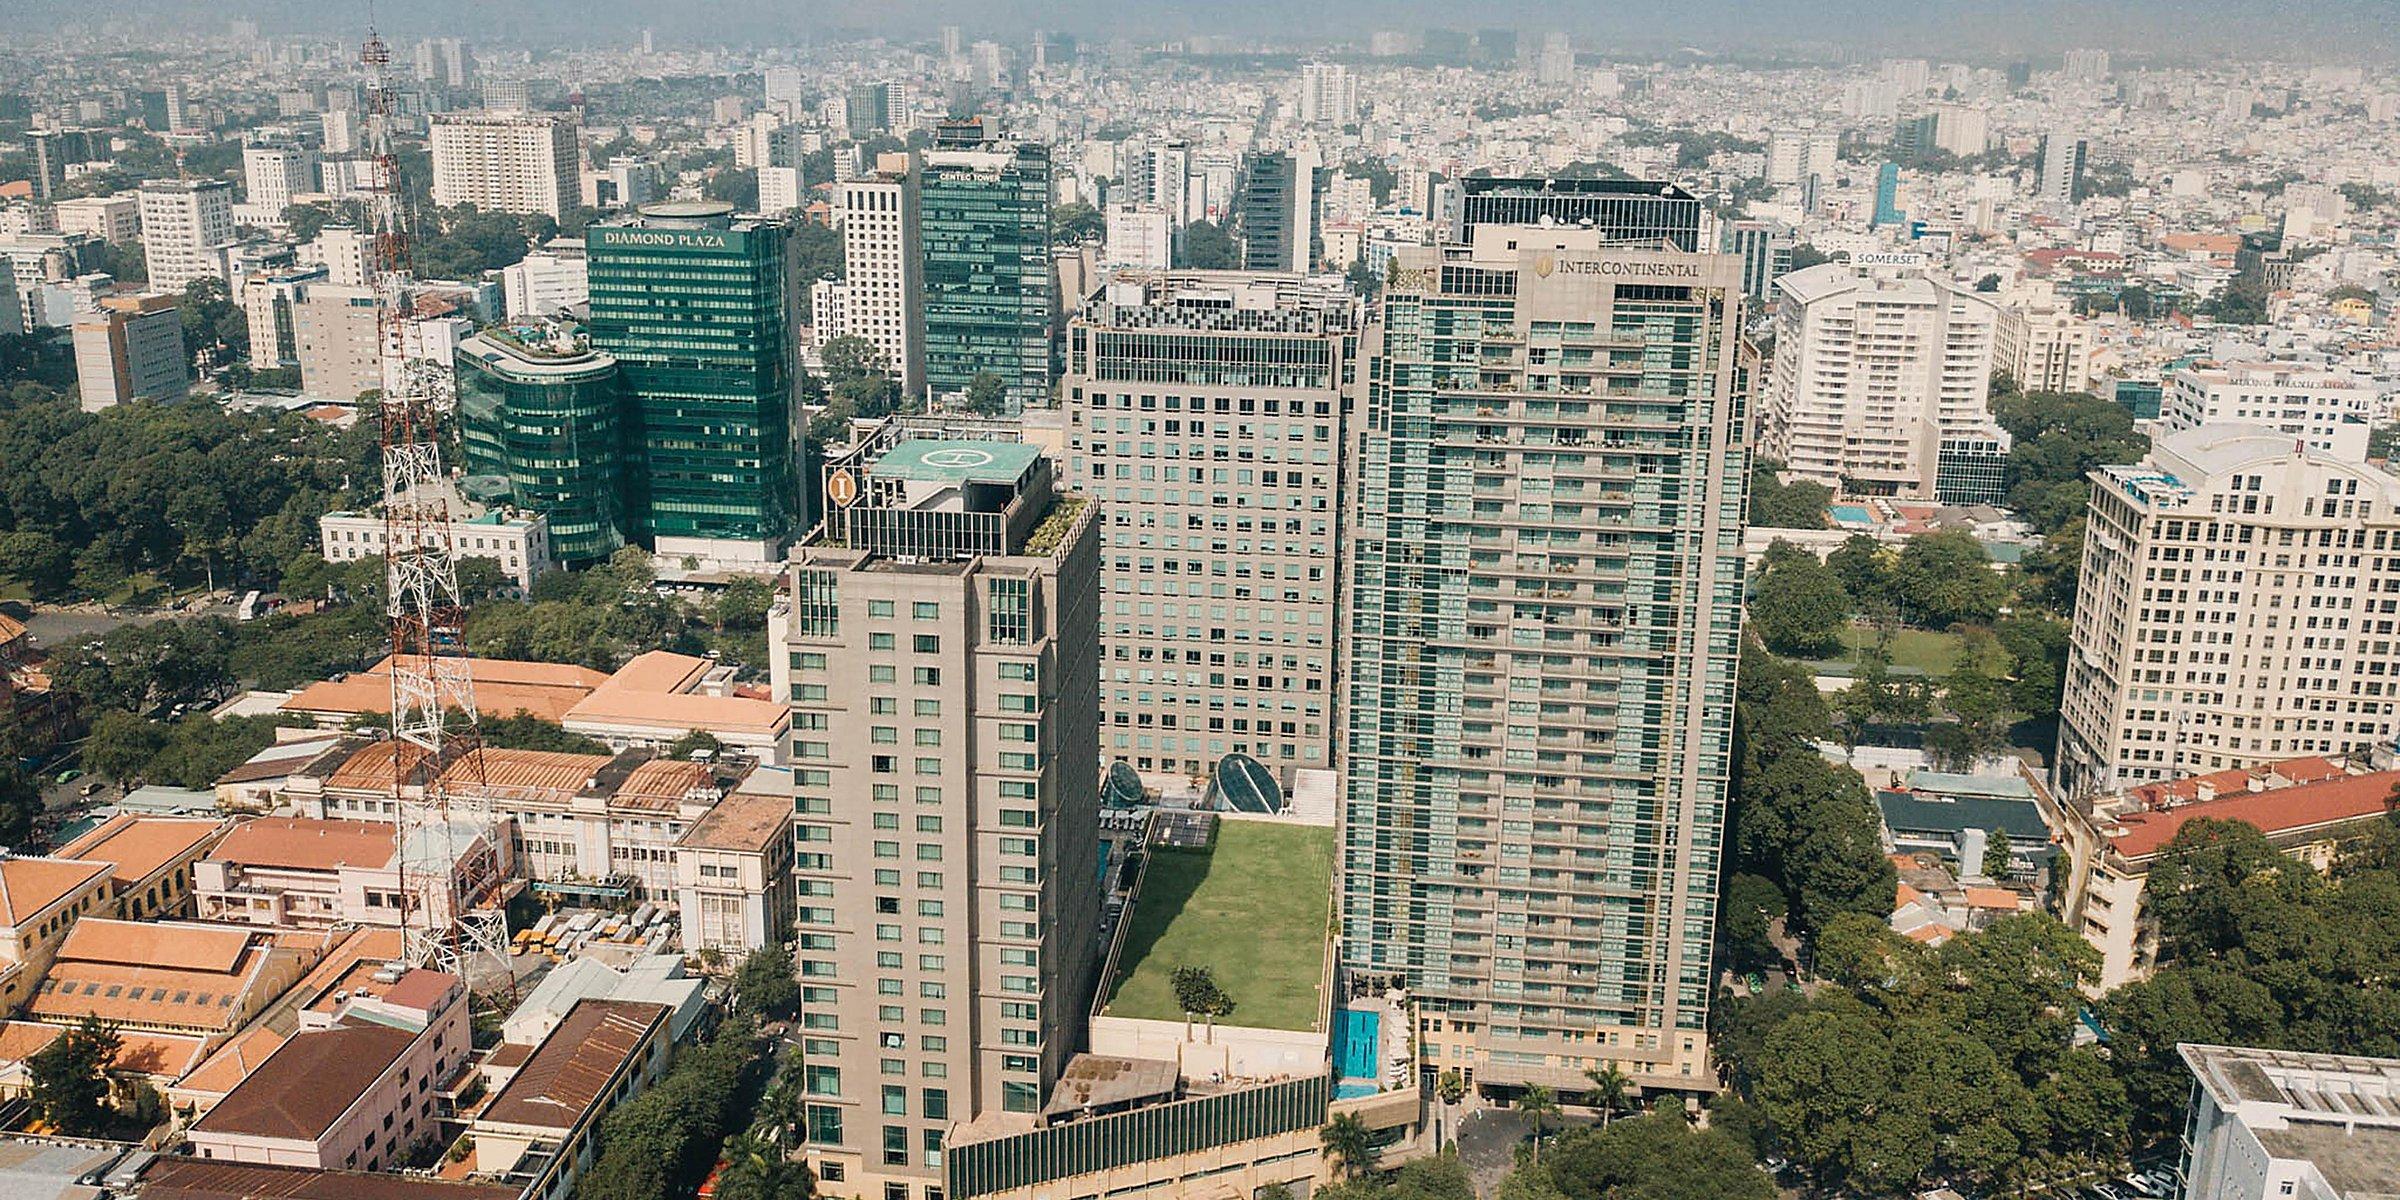 InterContinental Saigon - Ho Chi Minh City